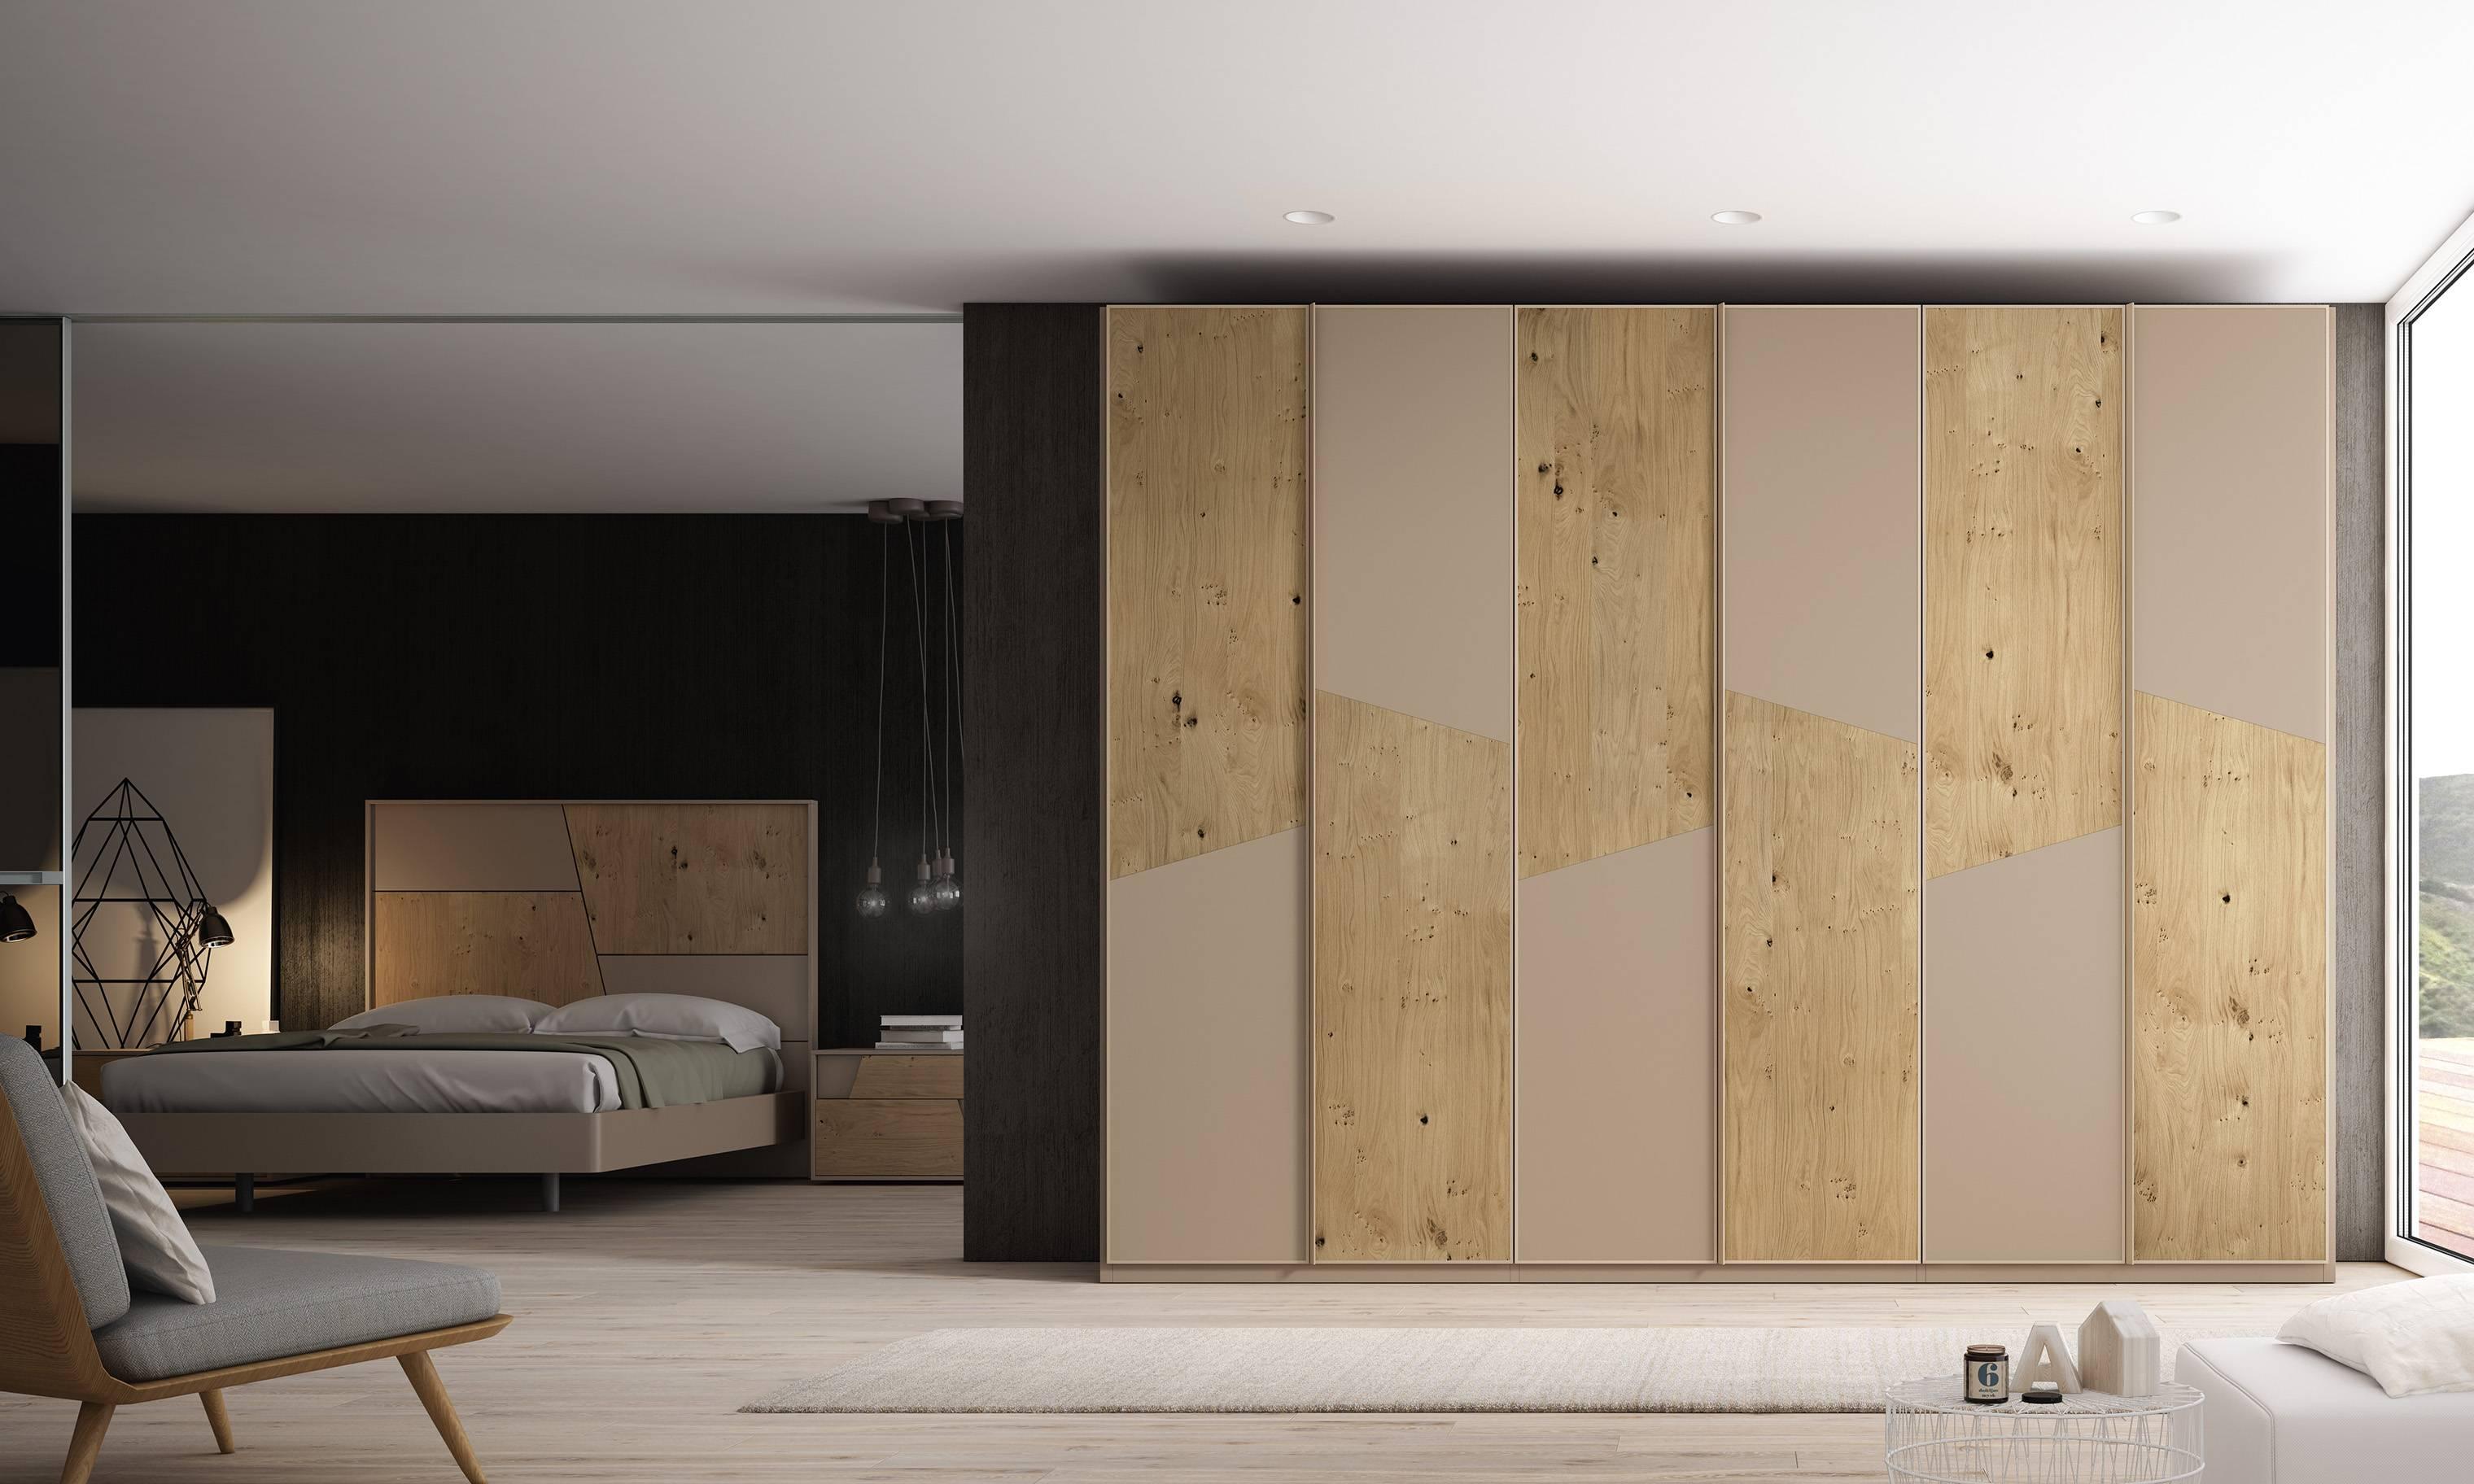 Armario milan puerta 012 muebles ogaru galvez toledo - Muebles en galvez ...